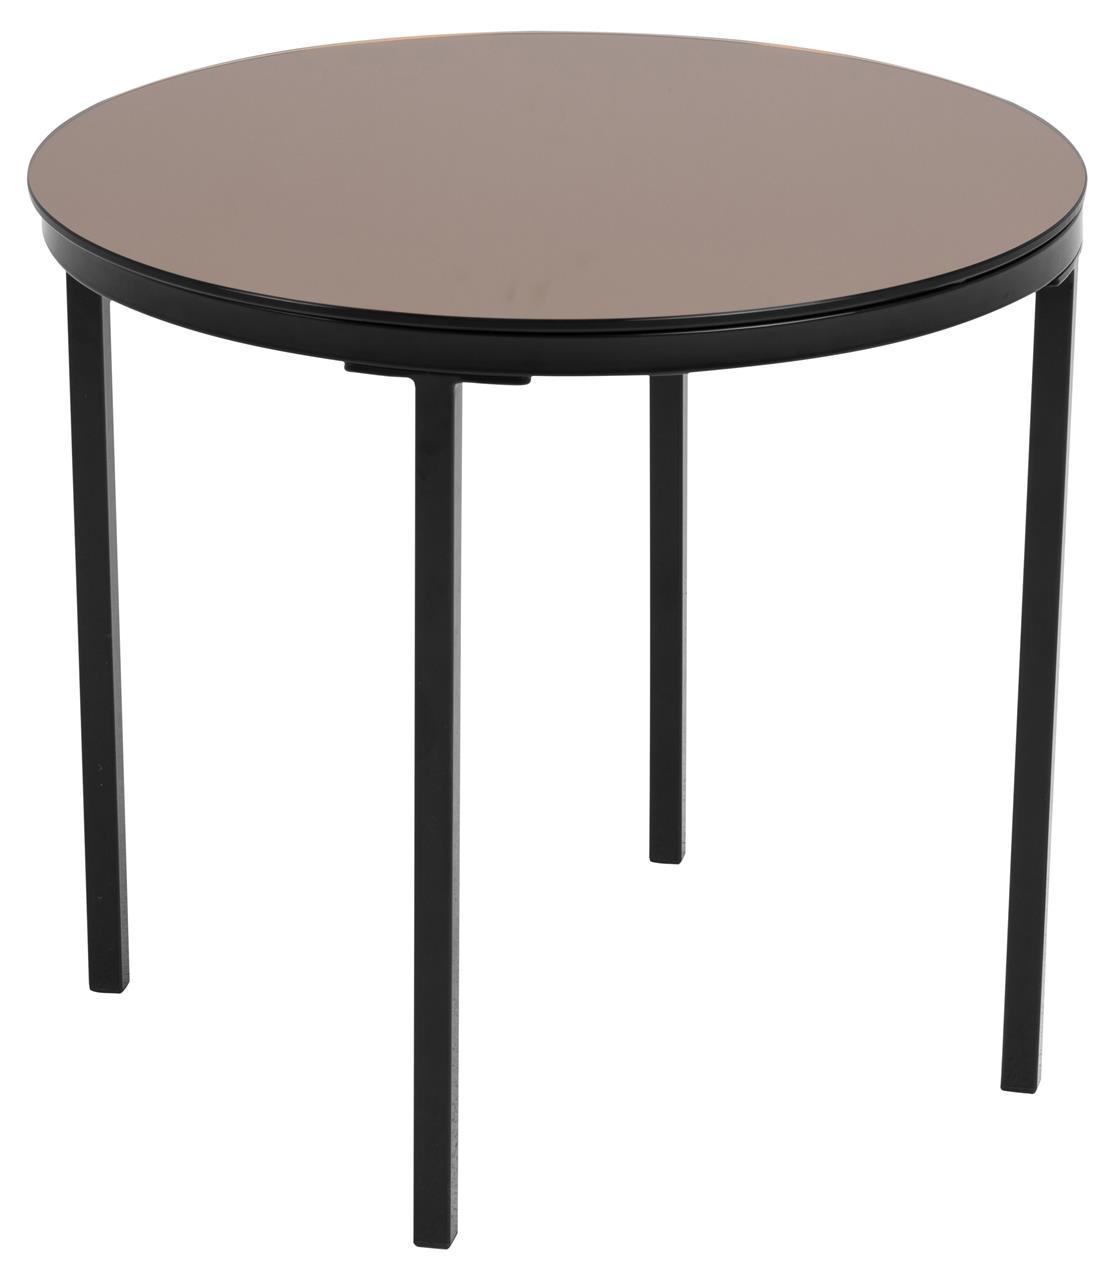 Masa de cafea din metal si sticla Gina II Alama / Negru, Ø50xH45 cm poza